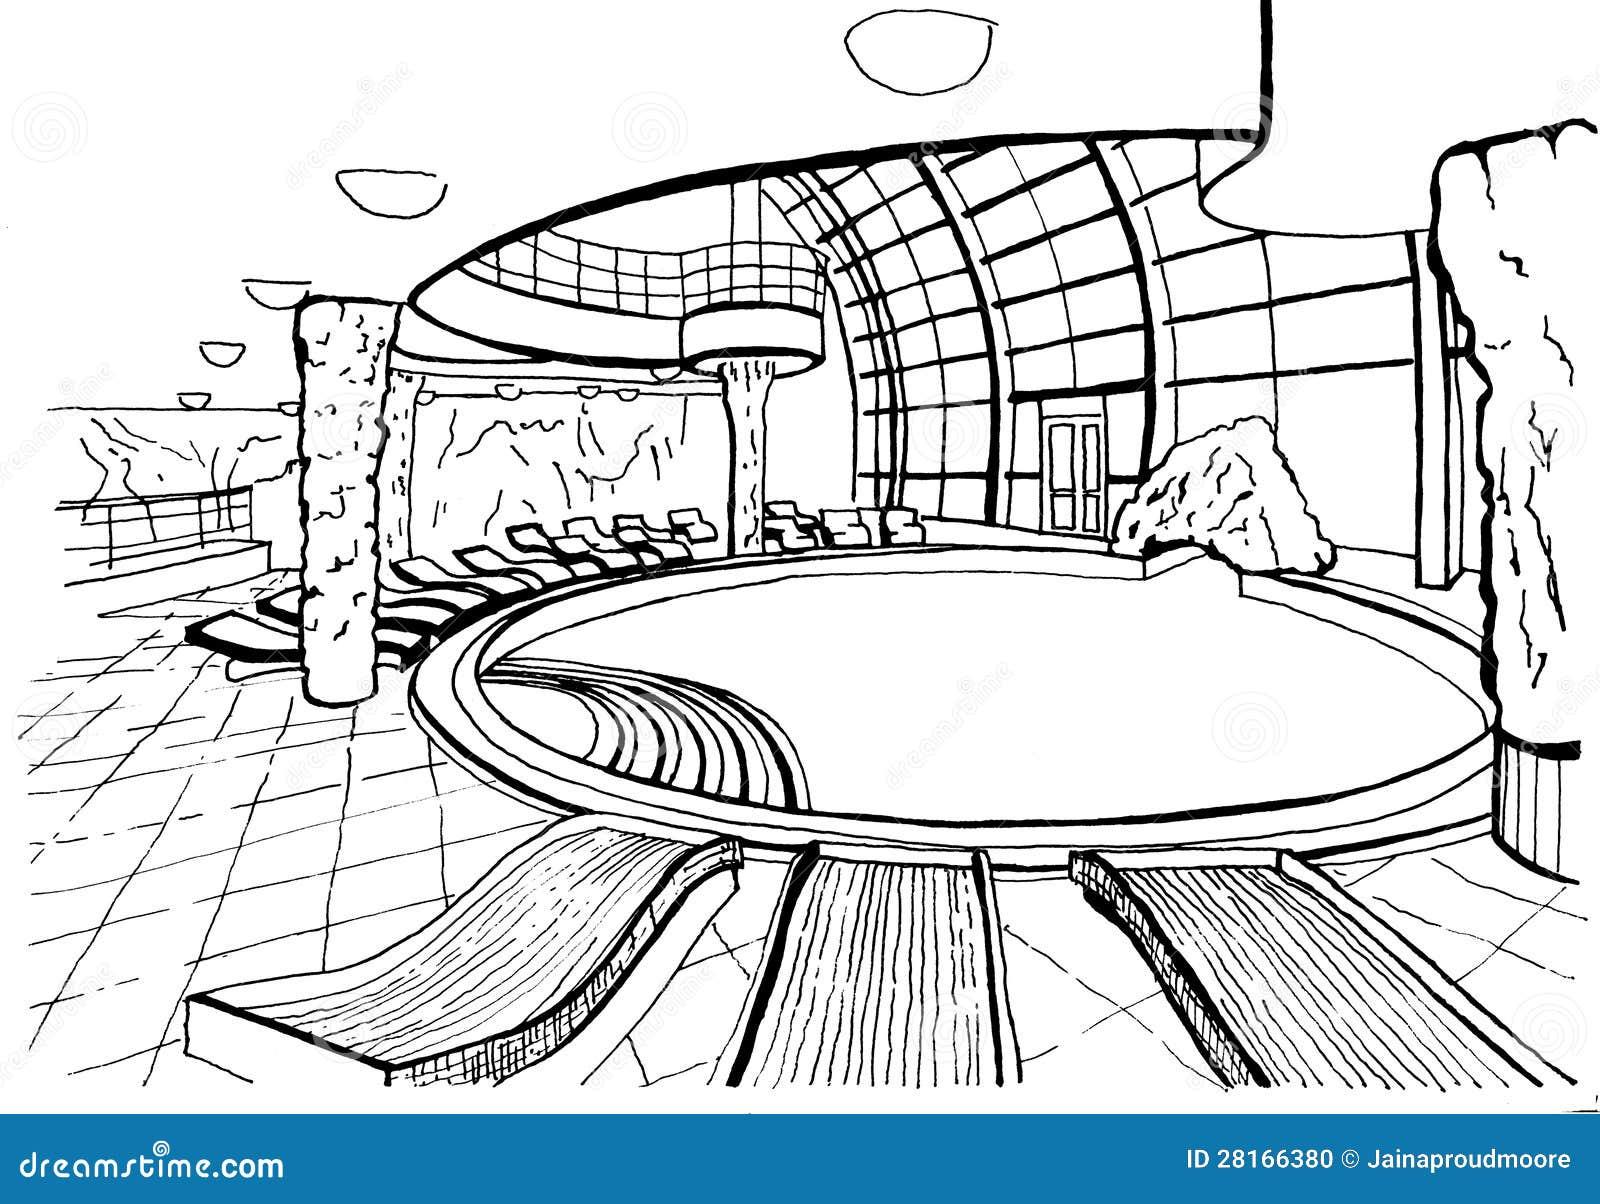 Swimming Pool Hand Drawing Inc Stock Photo Image 28166380